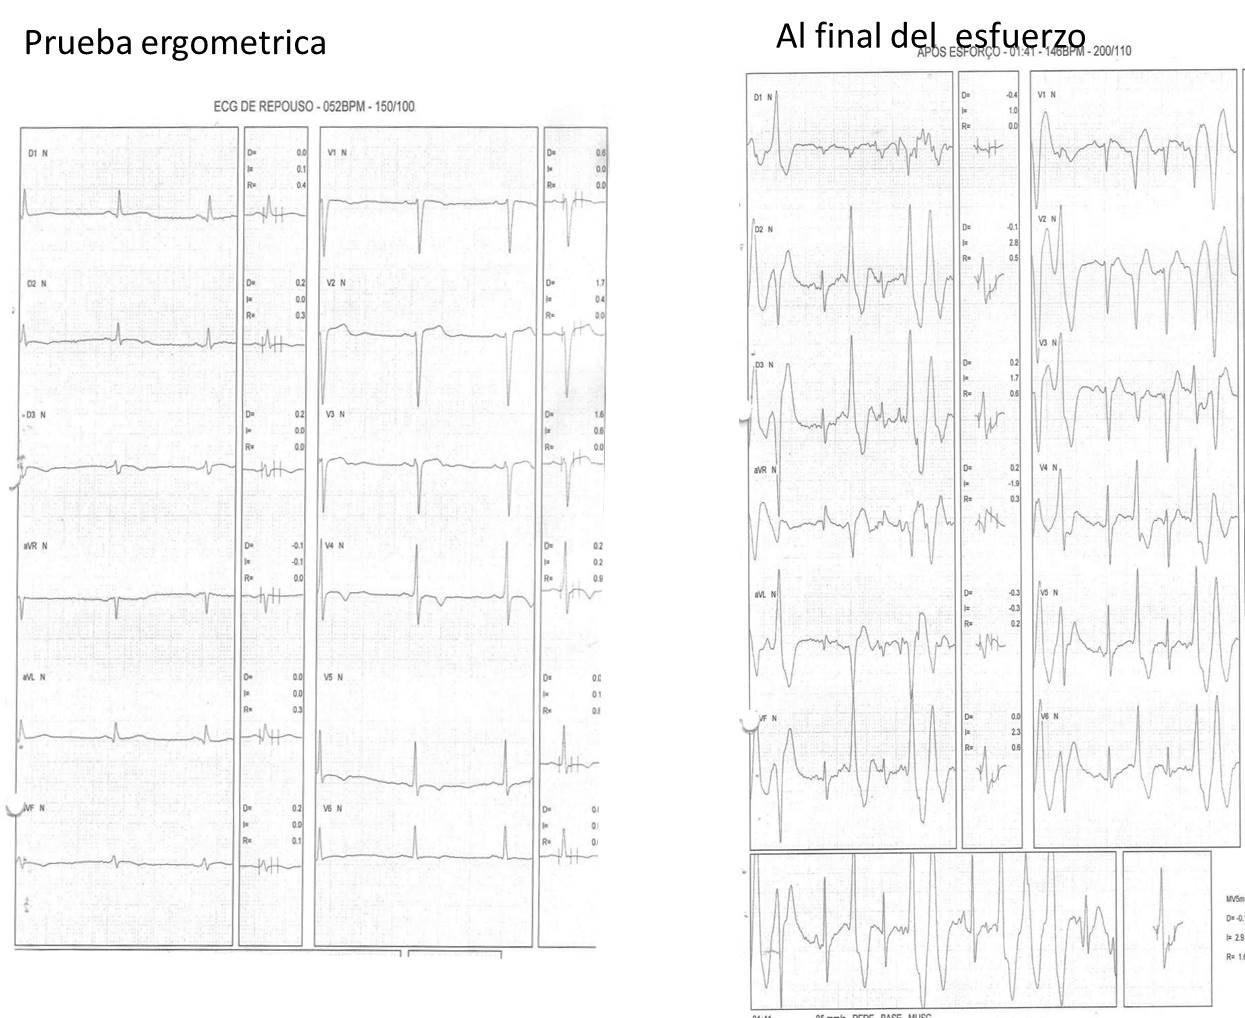 Paciente de 44 años con antecedentes de episodios de pérdida de conciencia durante esfuerzos que presenta taquicardia ventricular catecolaminérgica